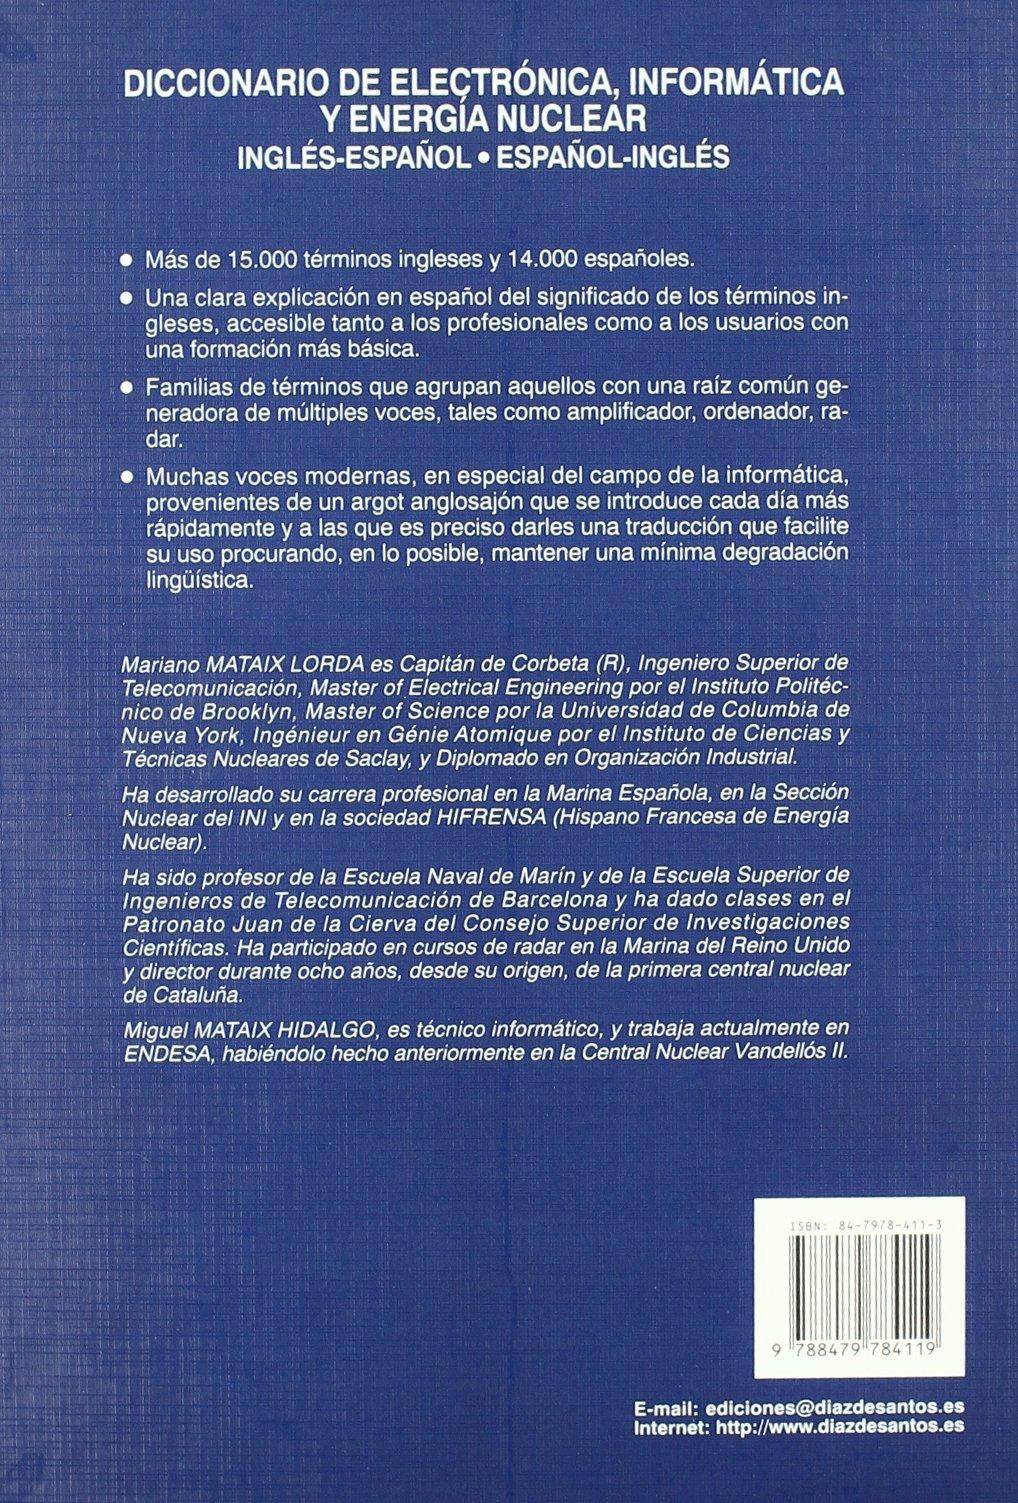 Diccionario de Electronica Informatica y Energia Nuclear (Spanish Edition): Mariano Mataix Lorda: 9788479784119: Amazon.com: Books